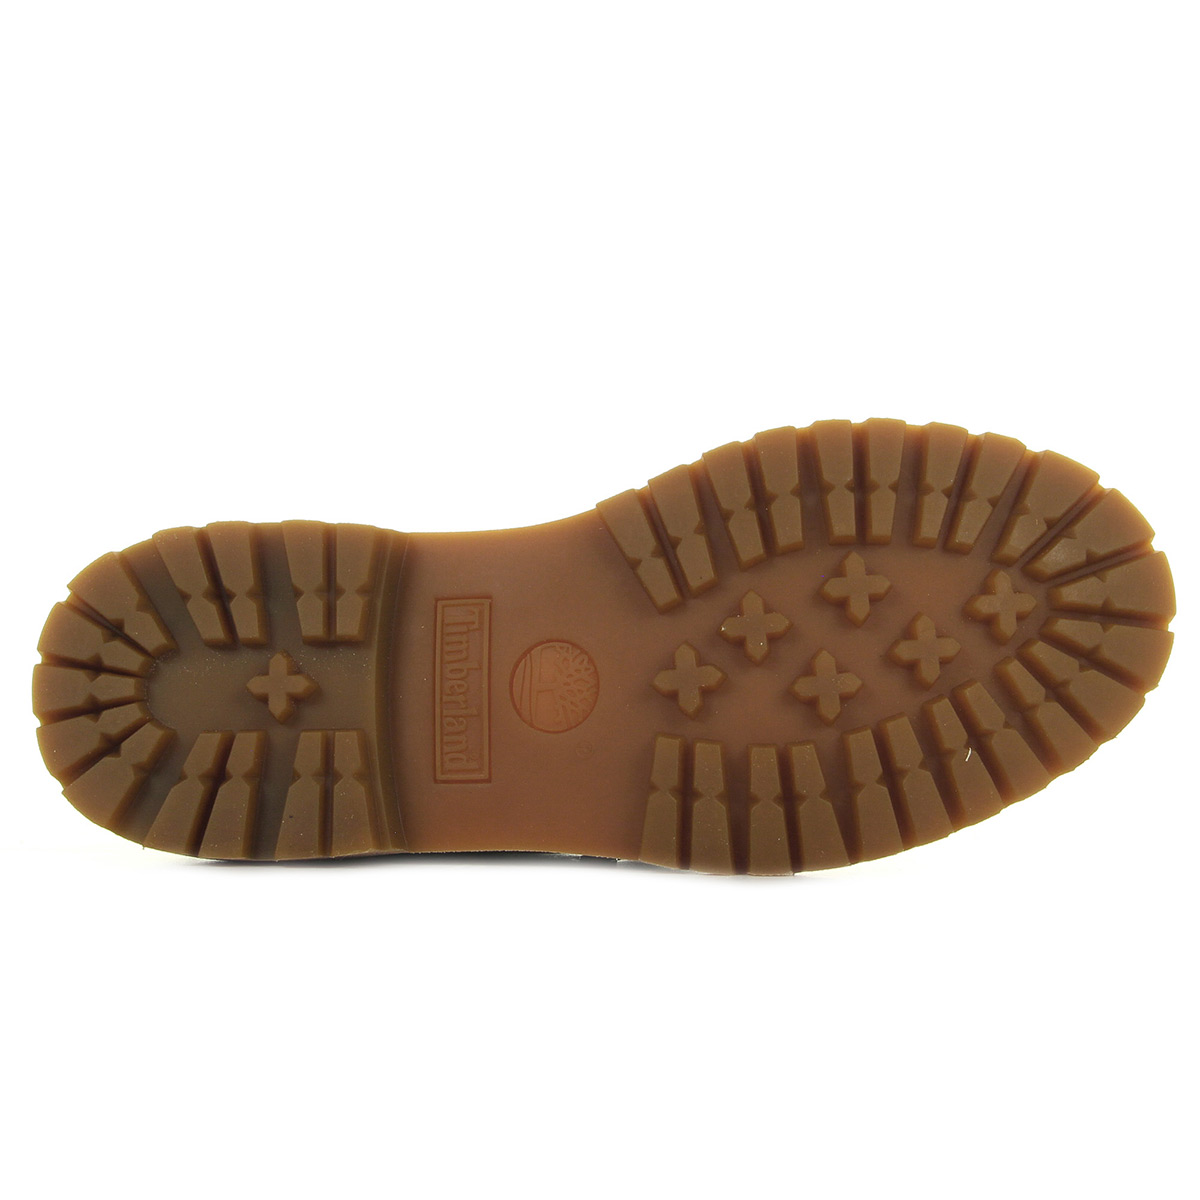 Boots Timberland Chukka Double Waterproof Boost Winter White Nubuck rjQgnLxb